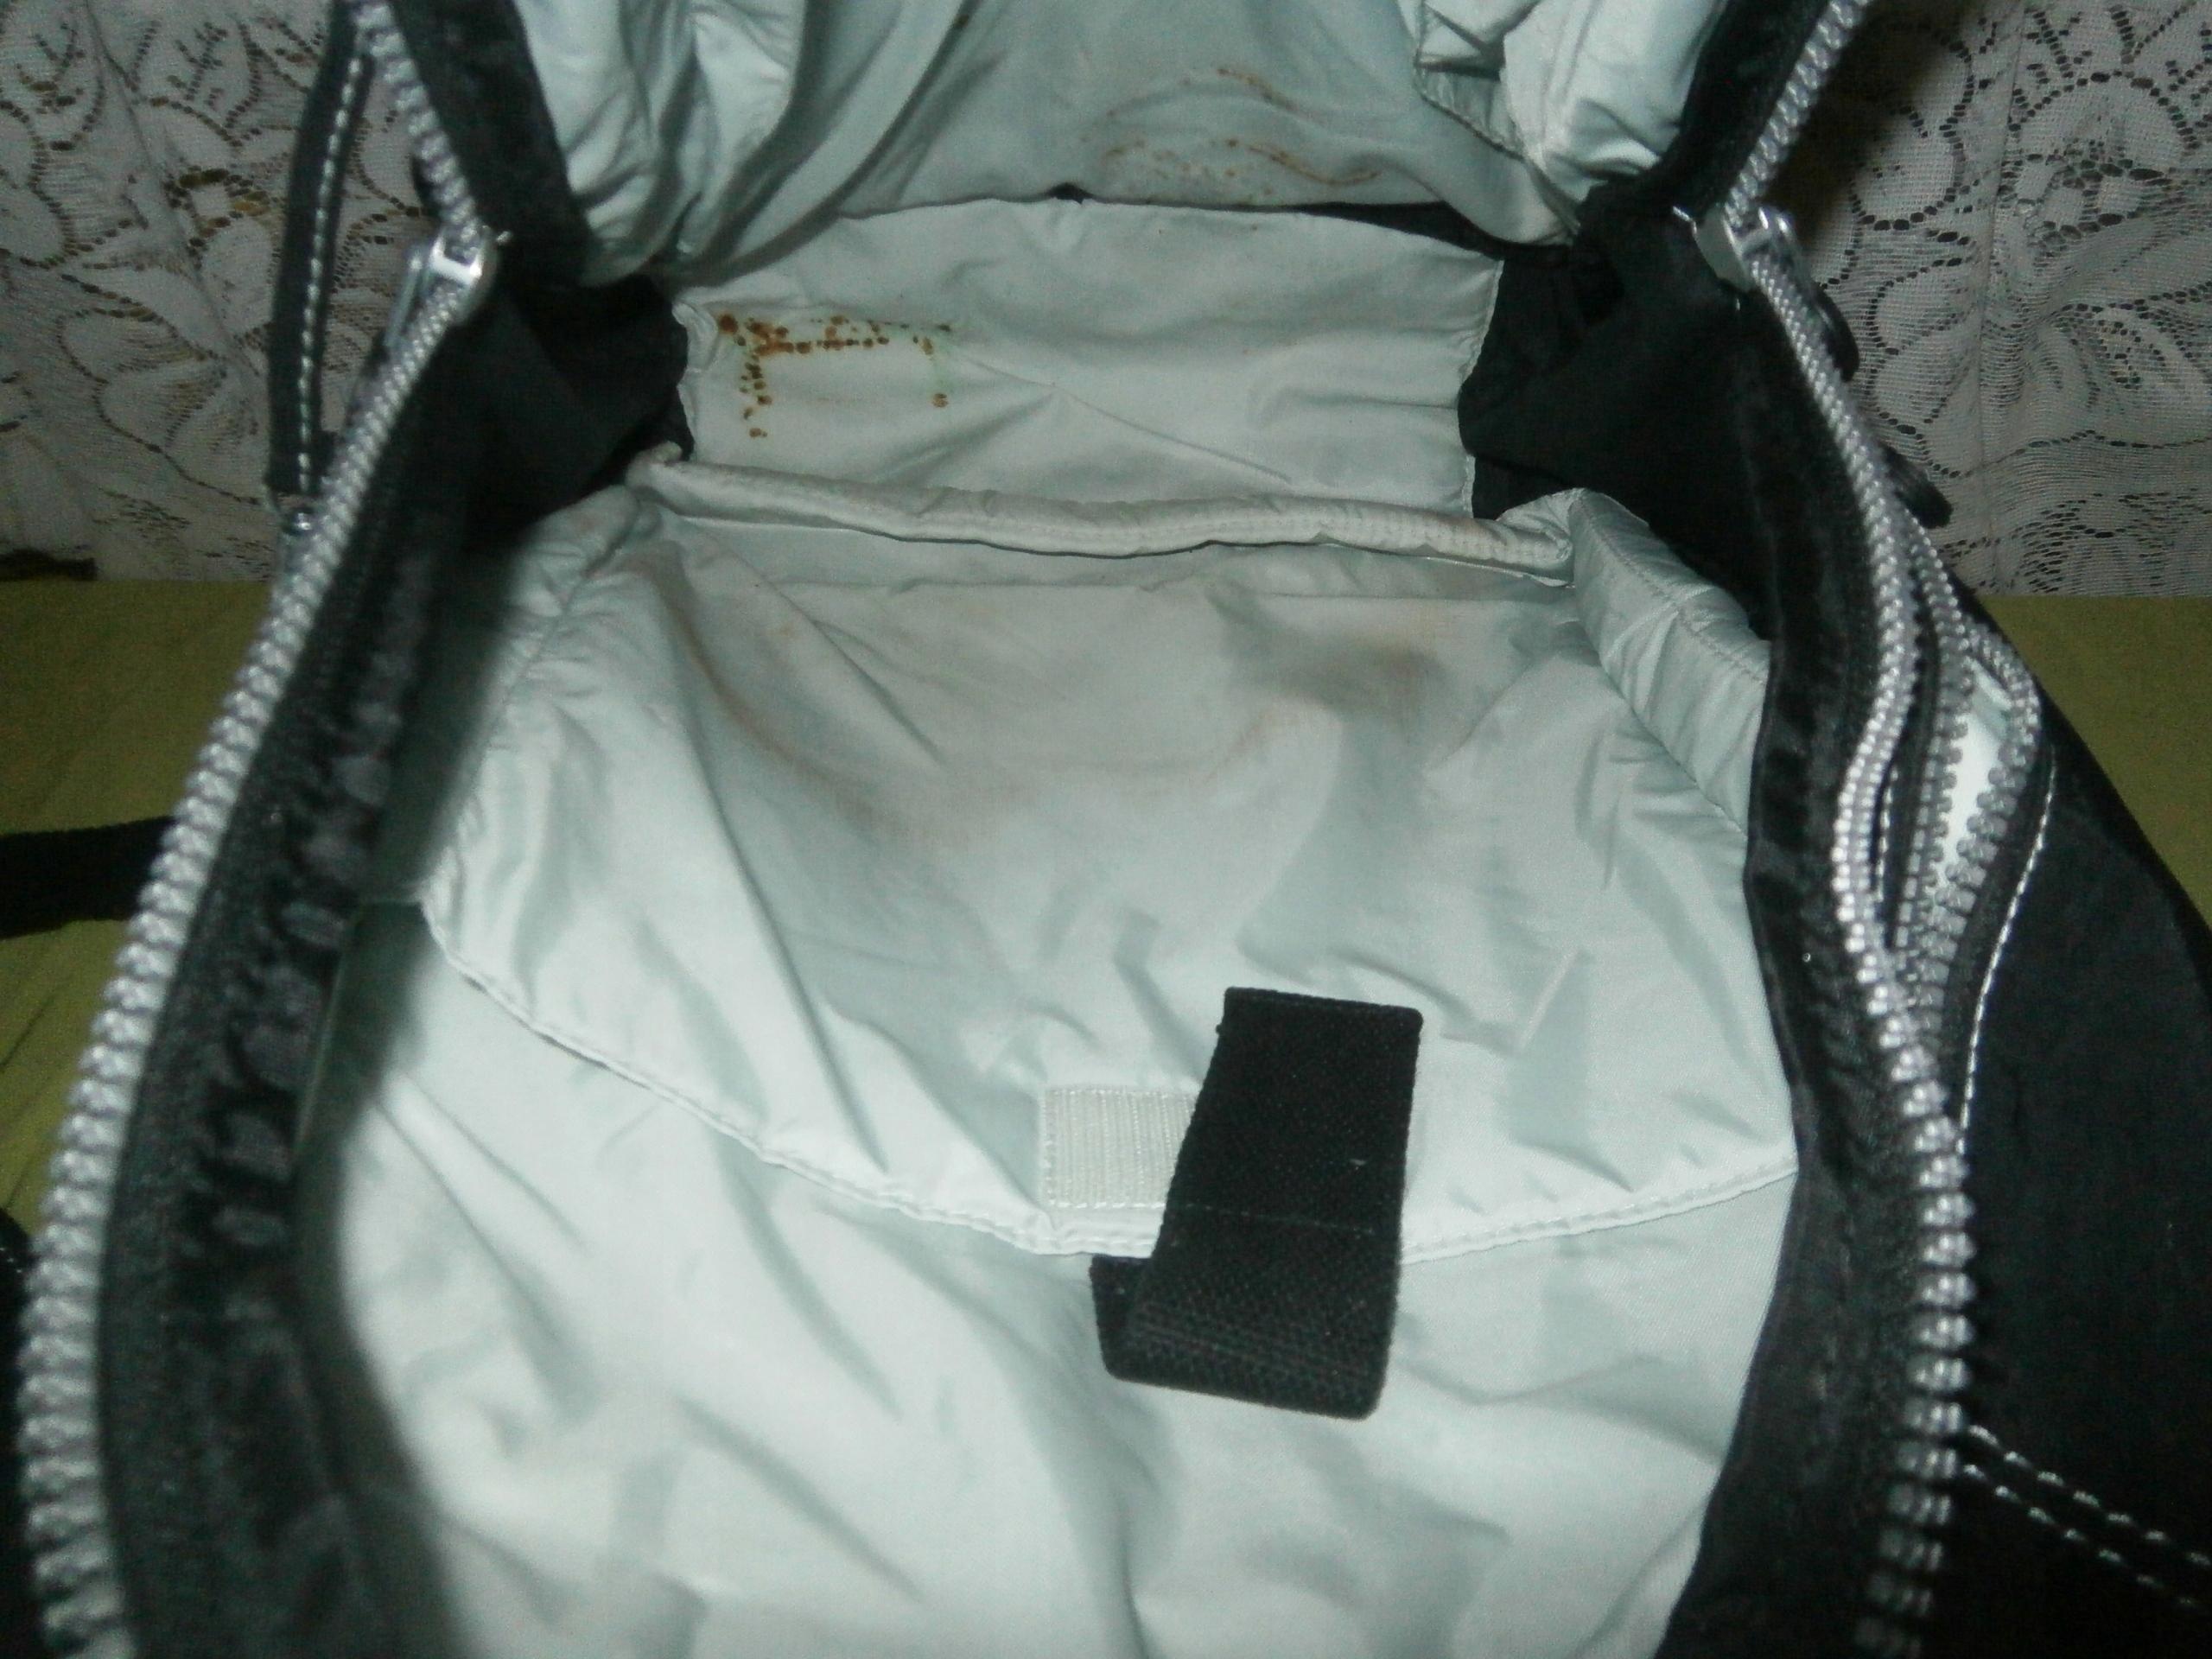 7659e0fdc8c29 Plecak Kipling - tekstylny - 7579689794 - oficjalne archiwum allegro